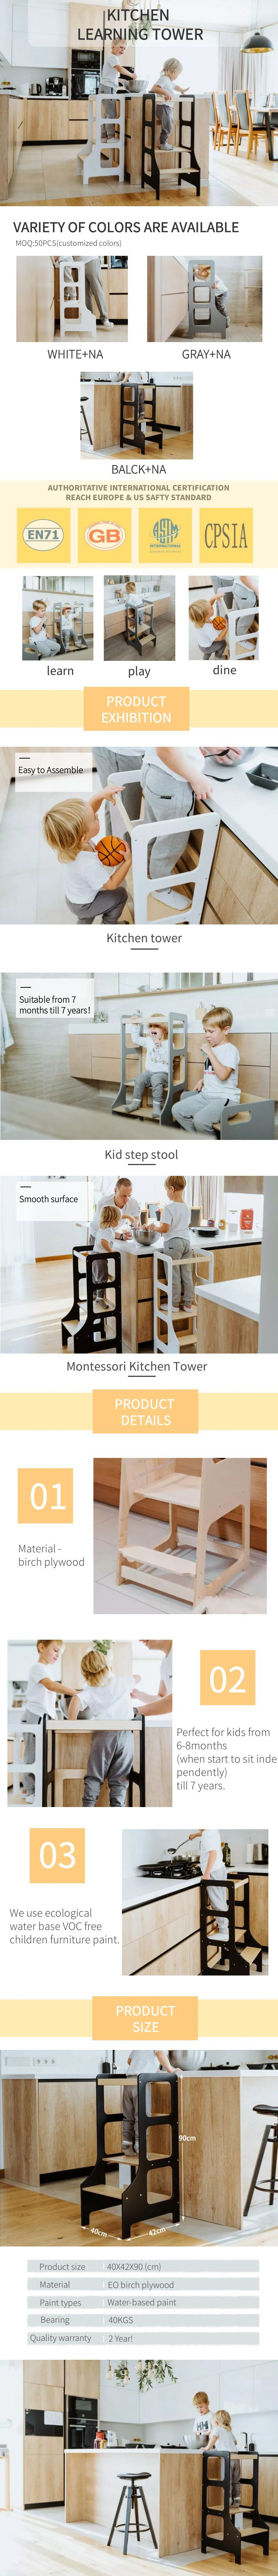 kitchen step stool for kids